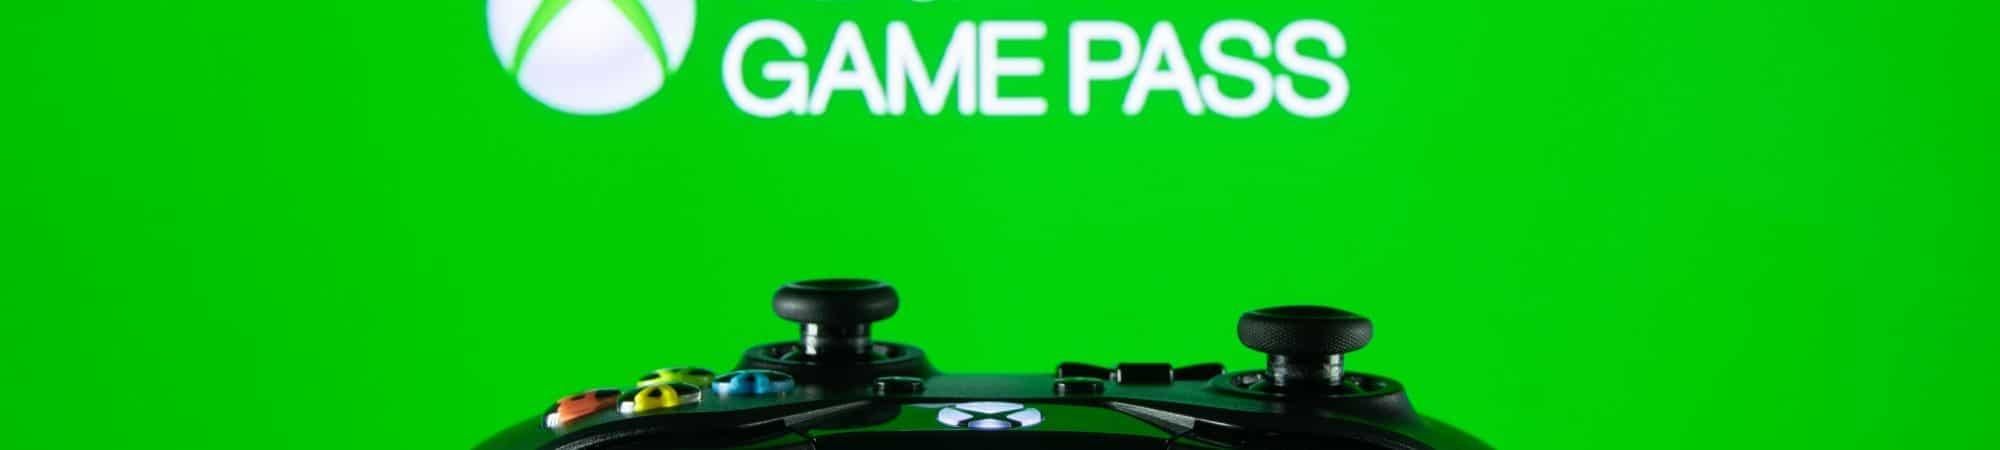 Xbox-Game-e-o-streaming-de-jogos-da-Microsoft-2000x450